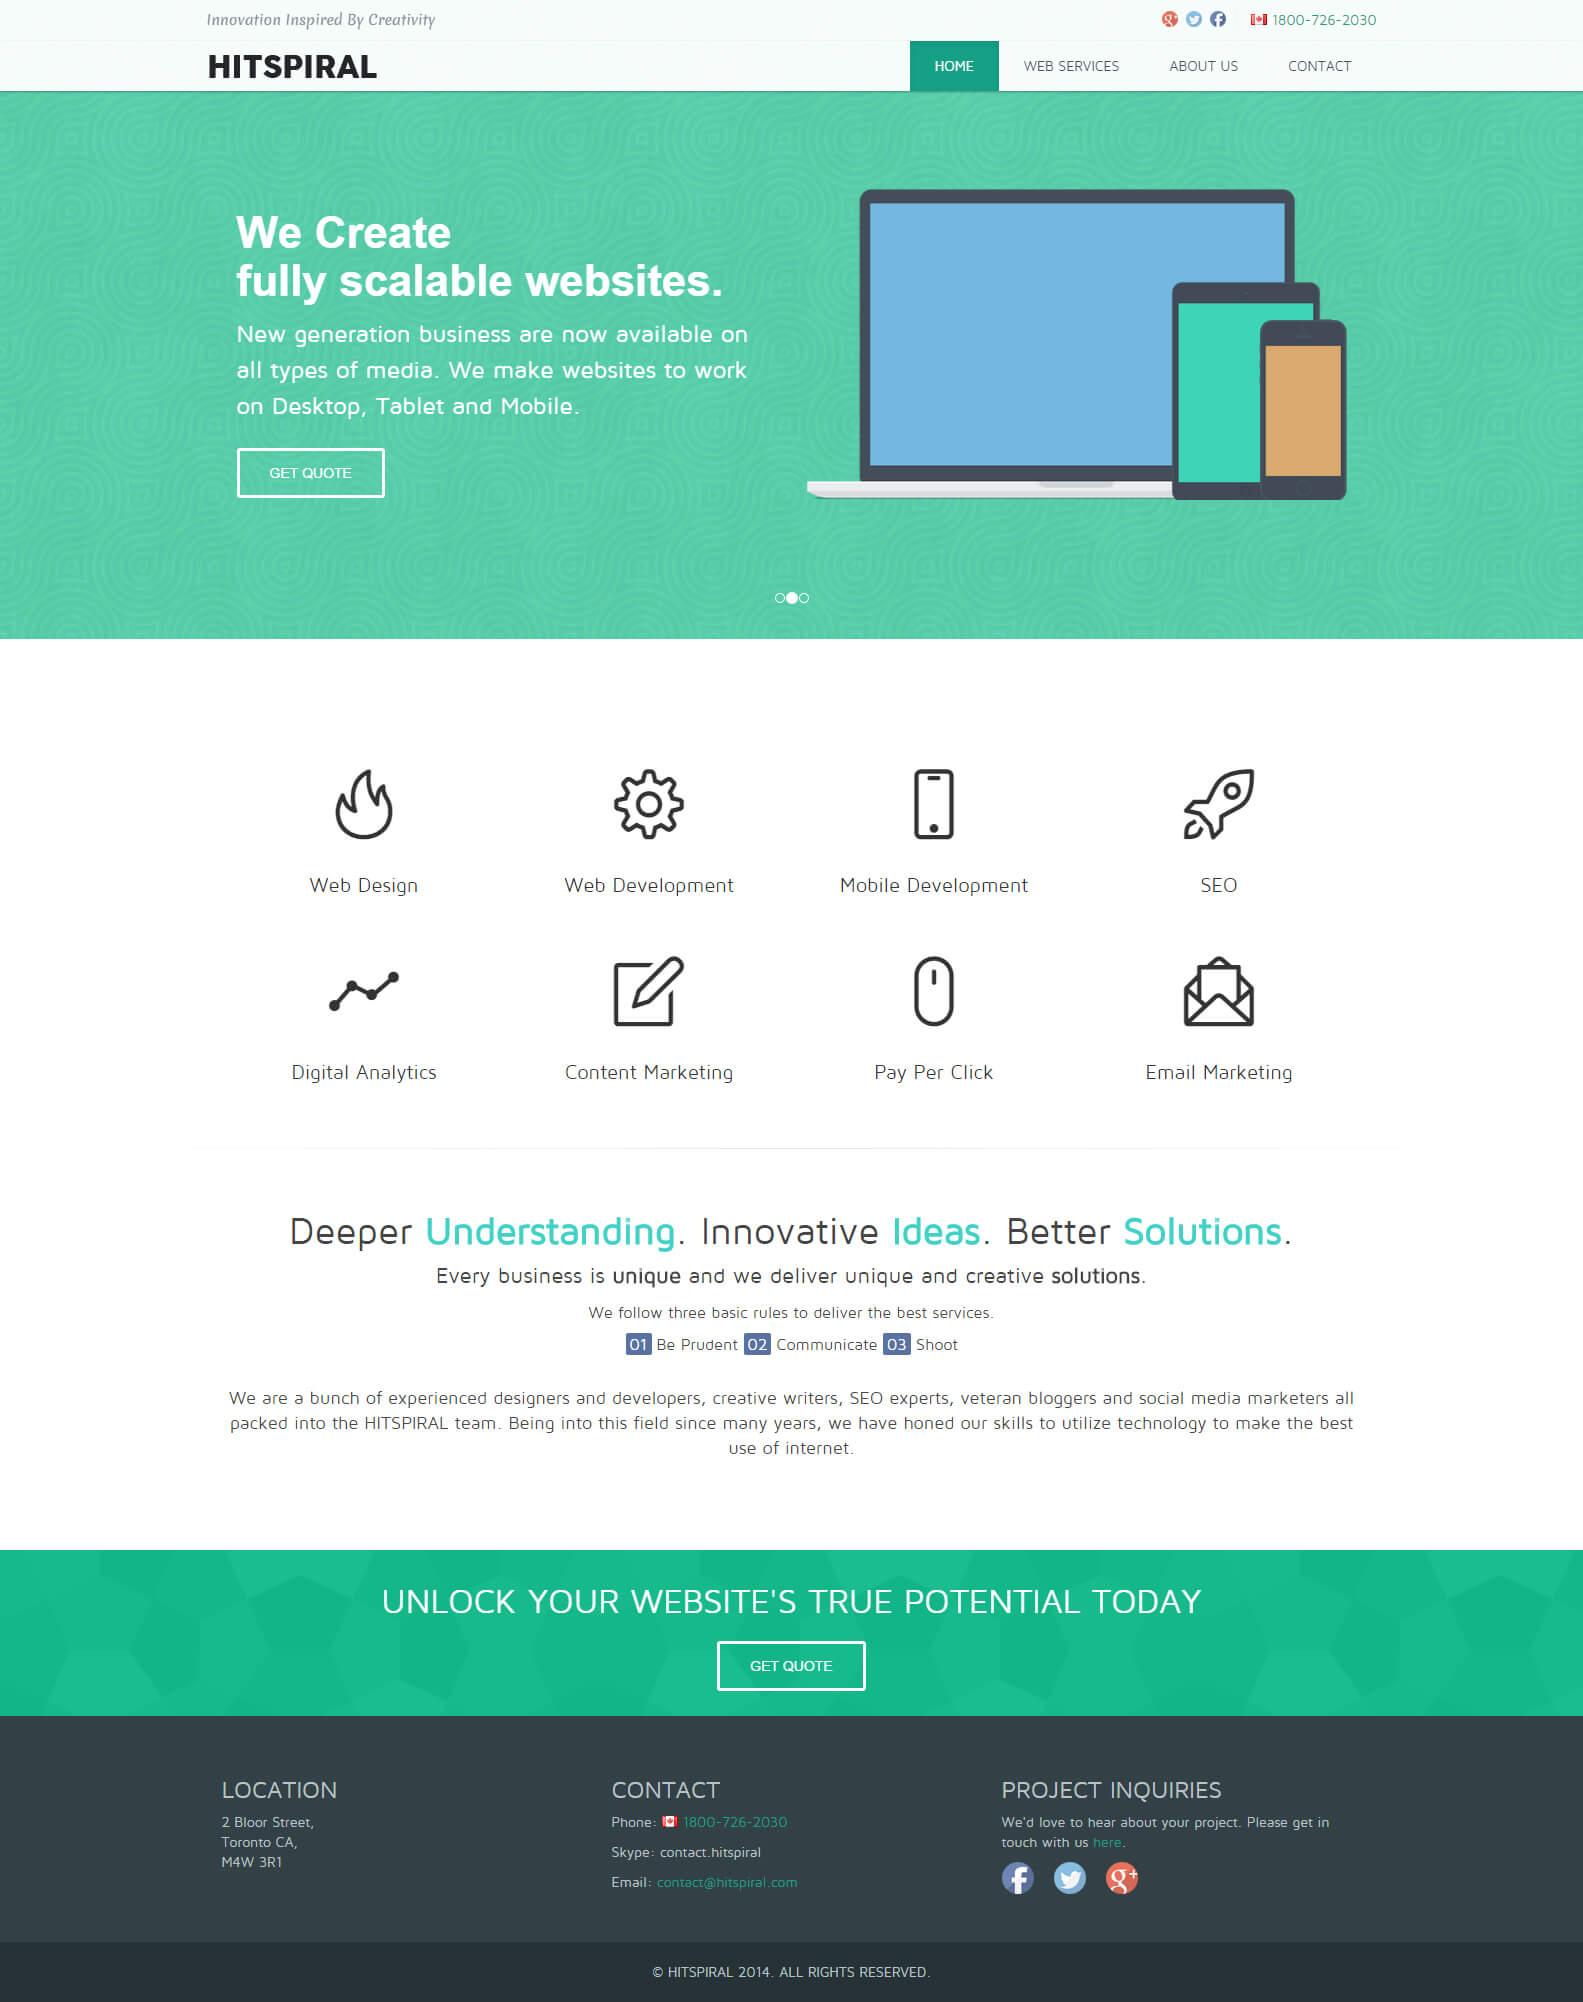 Hitspiral - Kumar Gaurav User Experience (UX) Designer